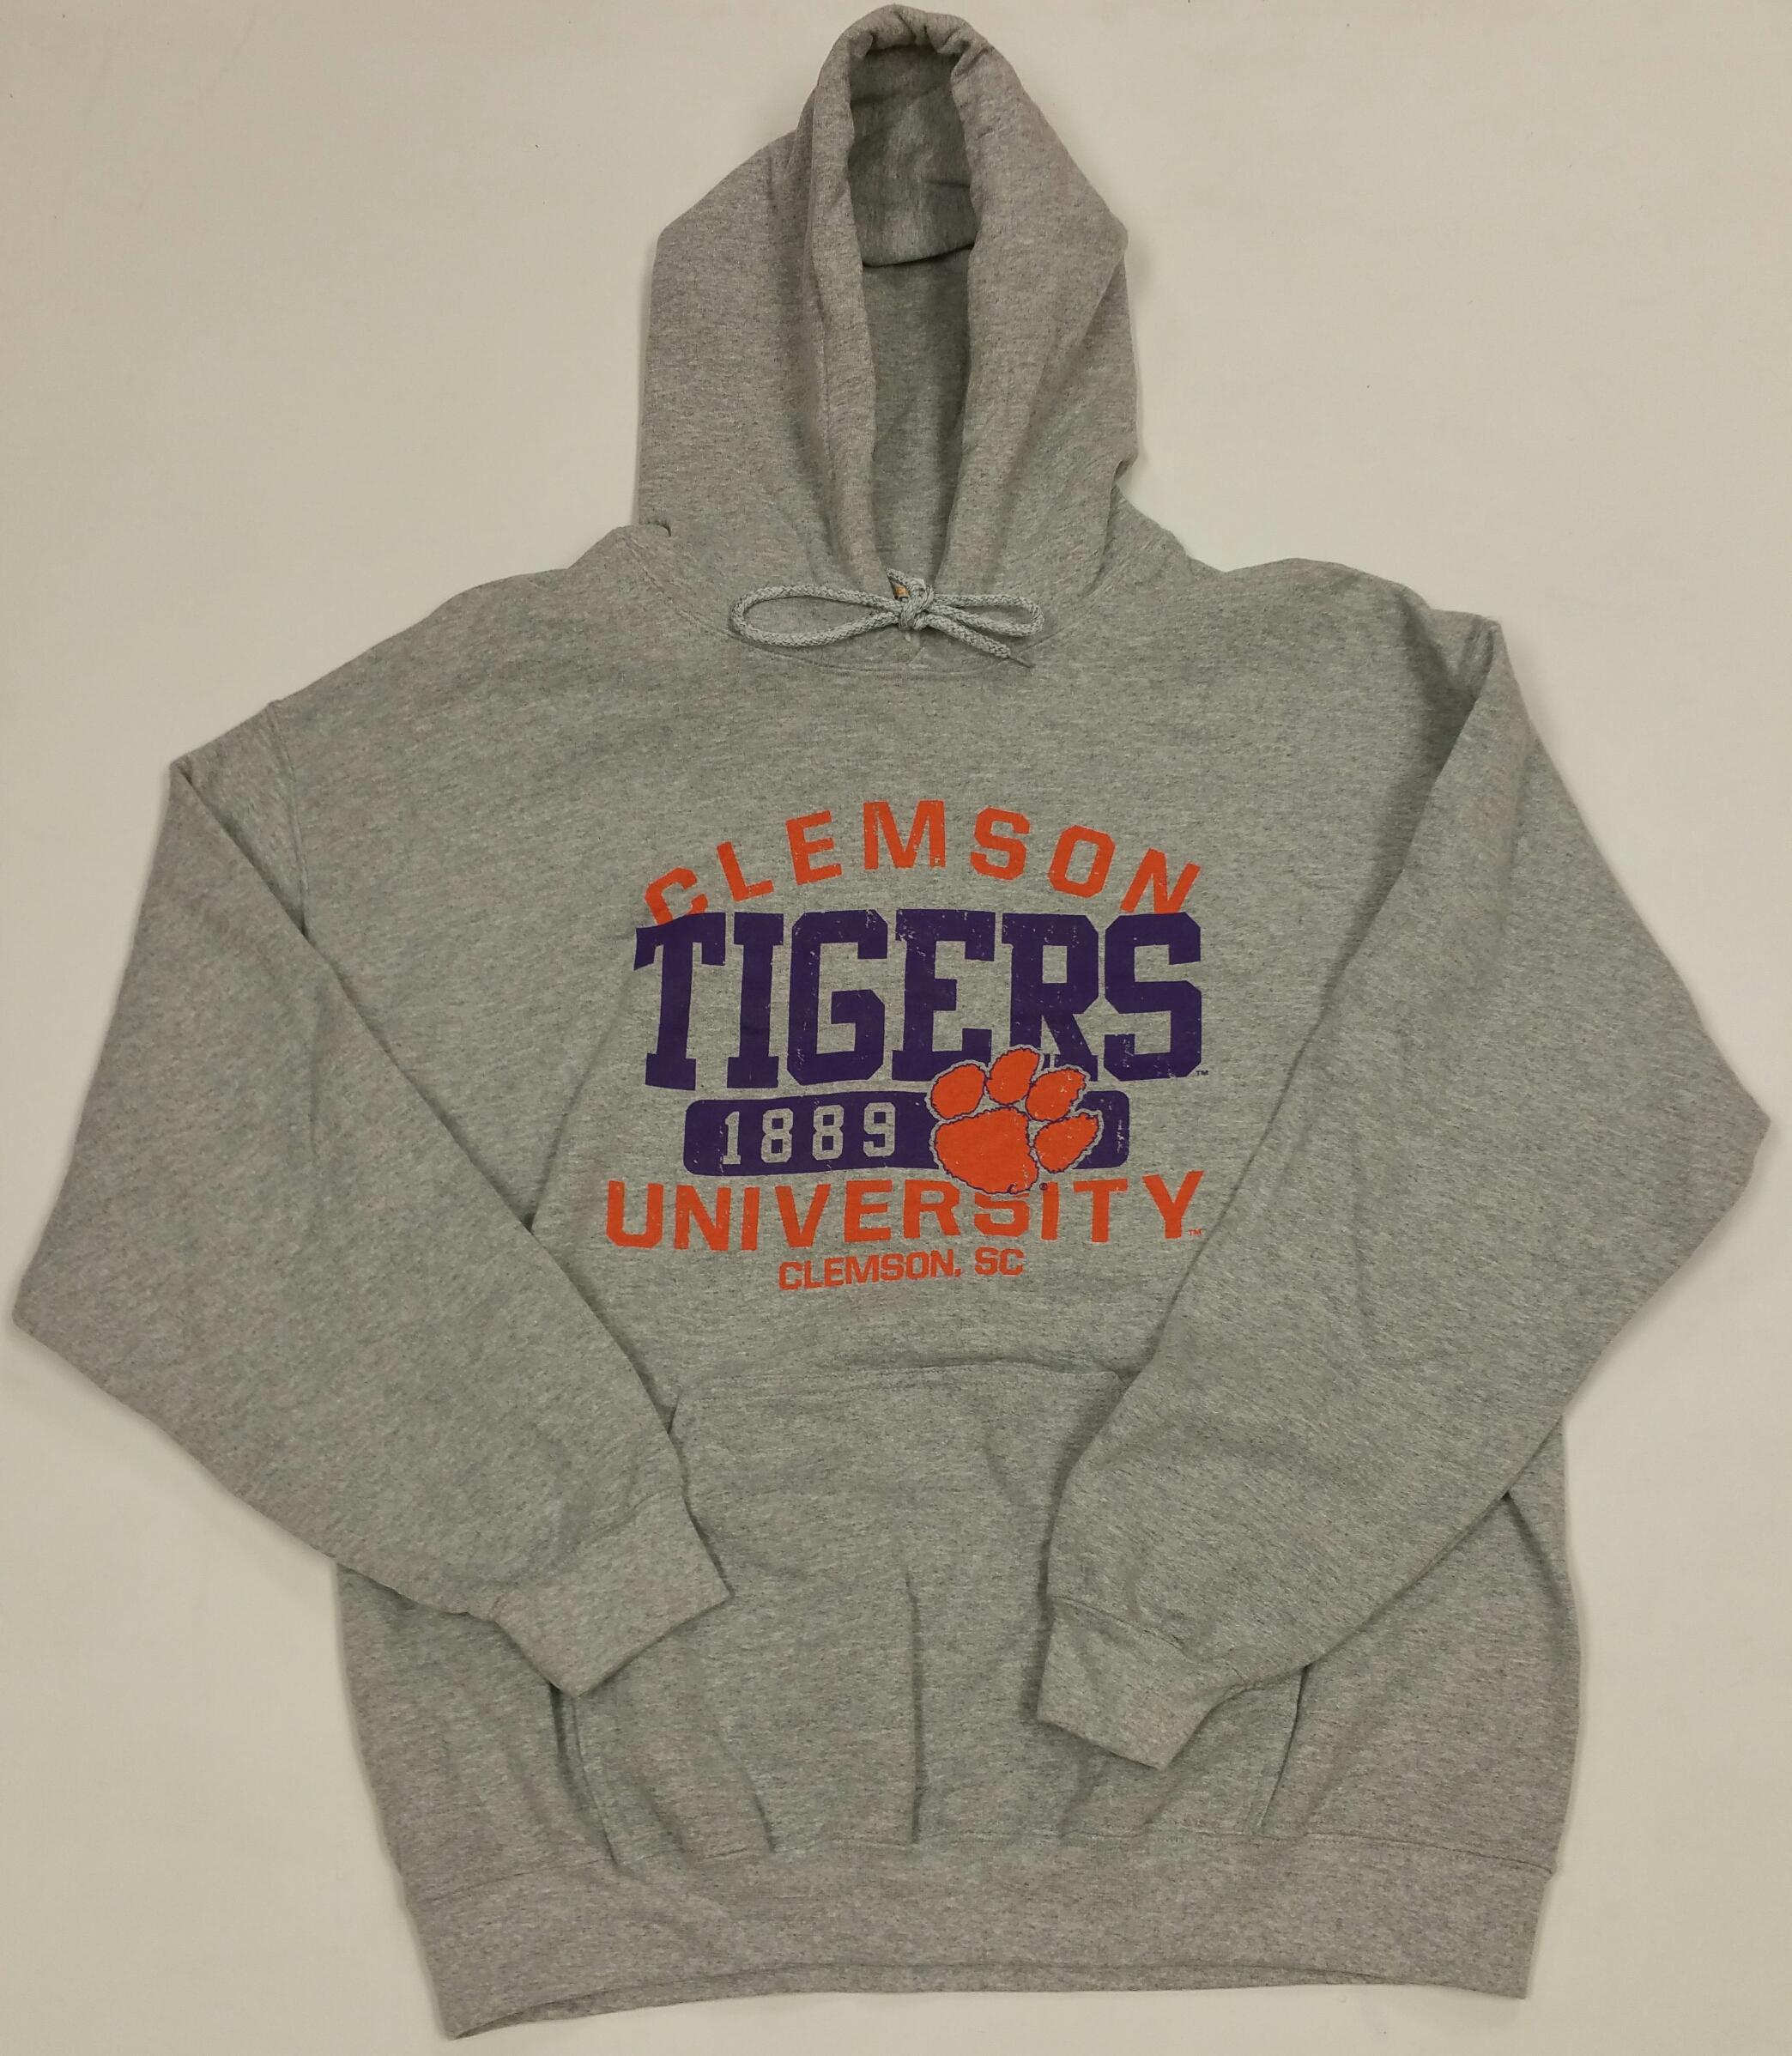 Clemson Tigers.jpg